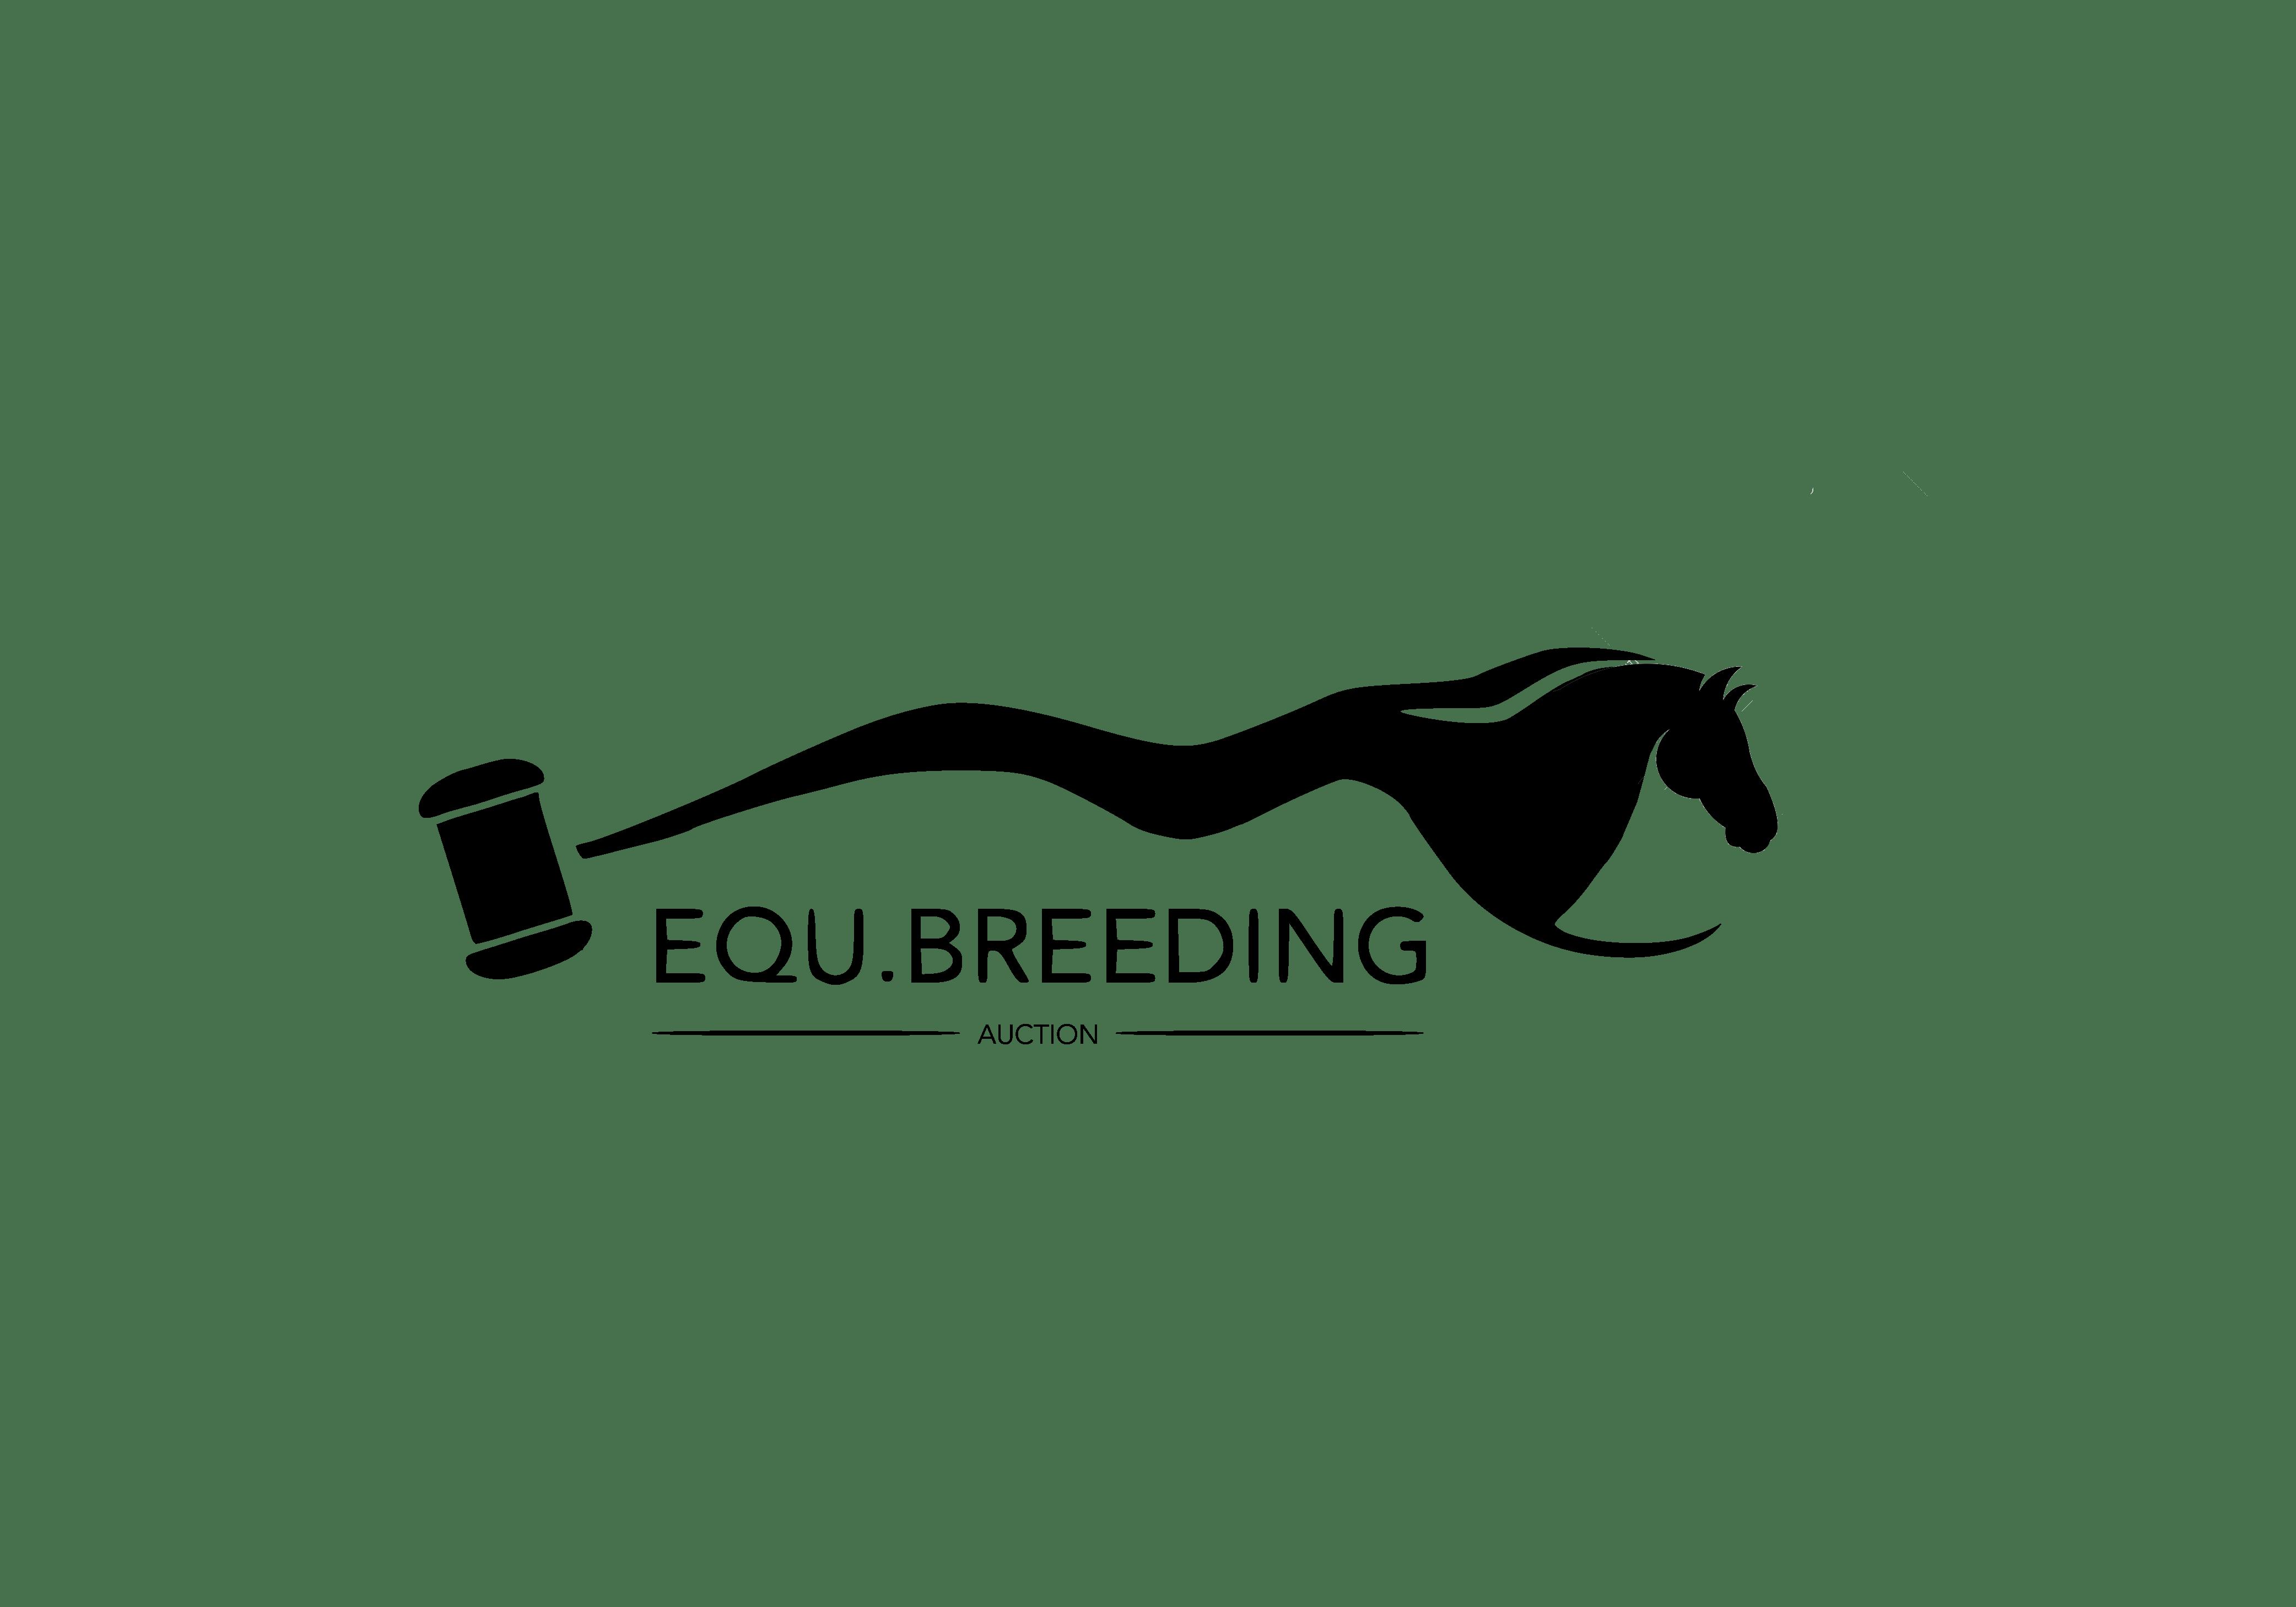 Equbreeding